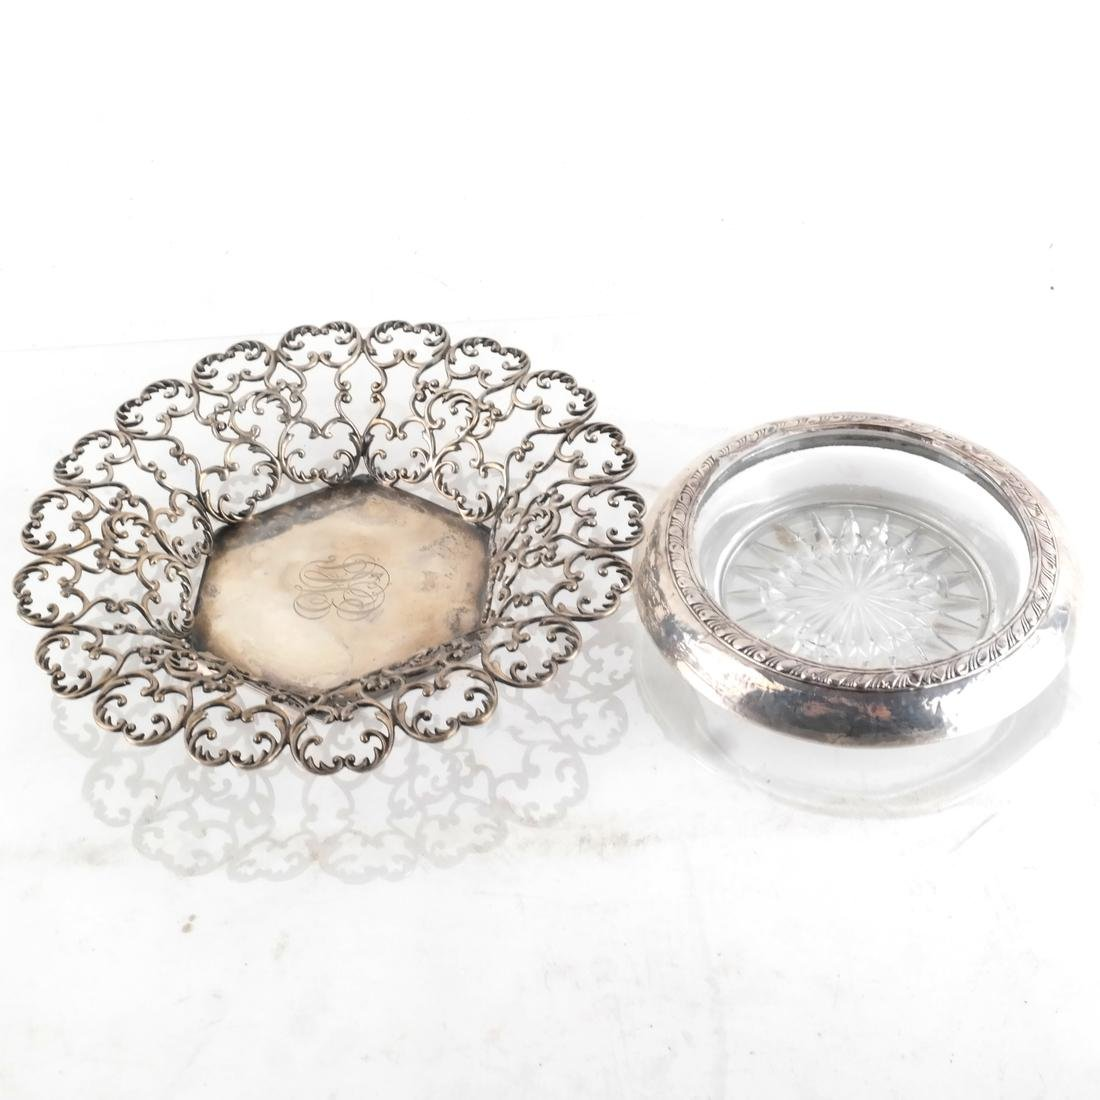 Asst. Silver Pin Trays, Receivers, Flasks - 4